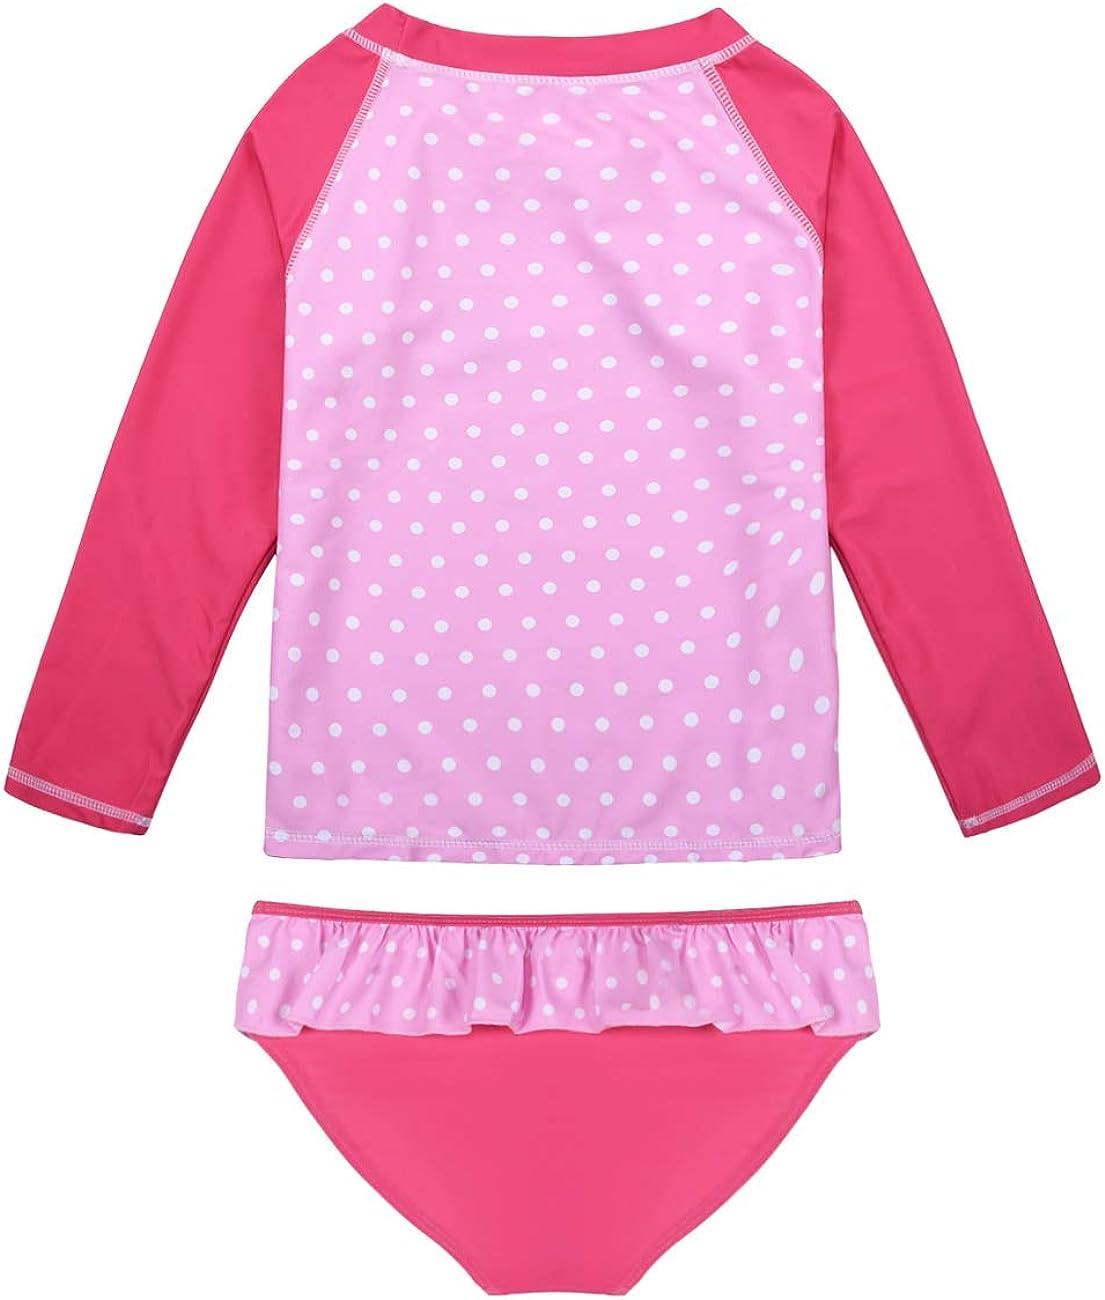 Hilor Girls Two Piece Swimsuits Long Sleeves Rashguard UPF 50 Tankini Set Bathing Suits